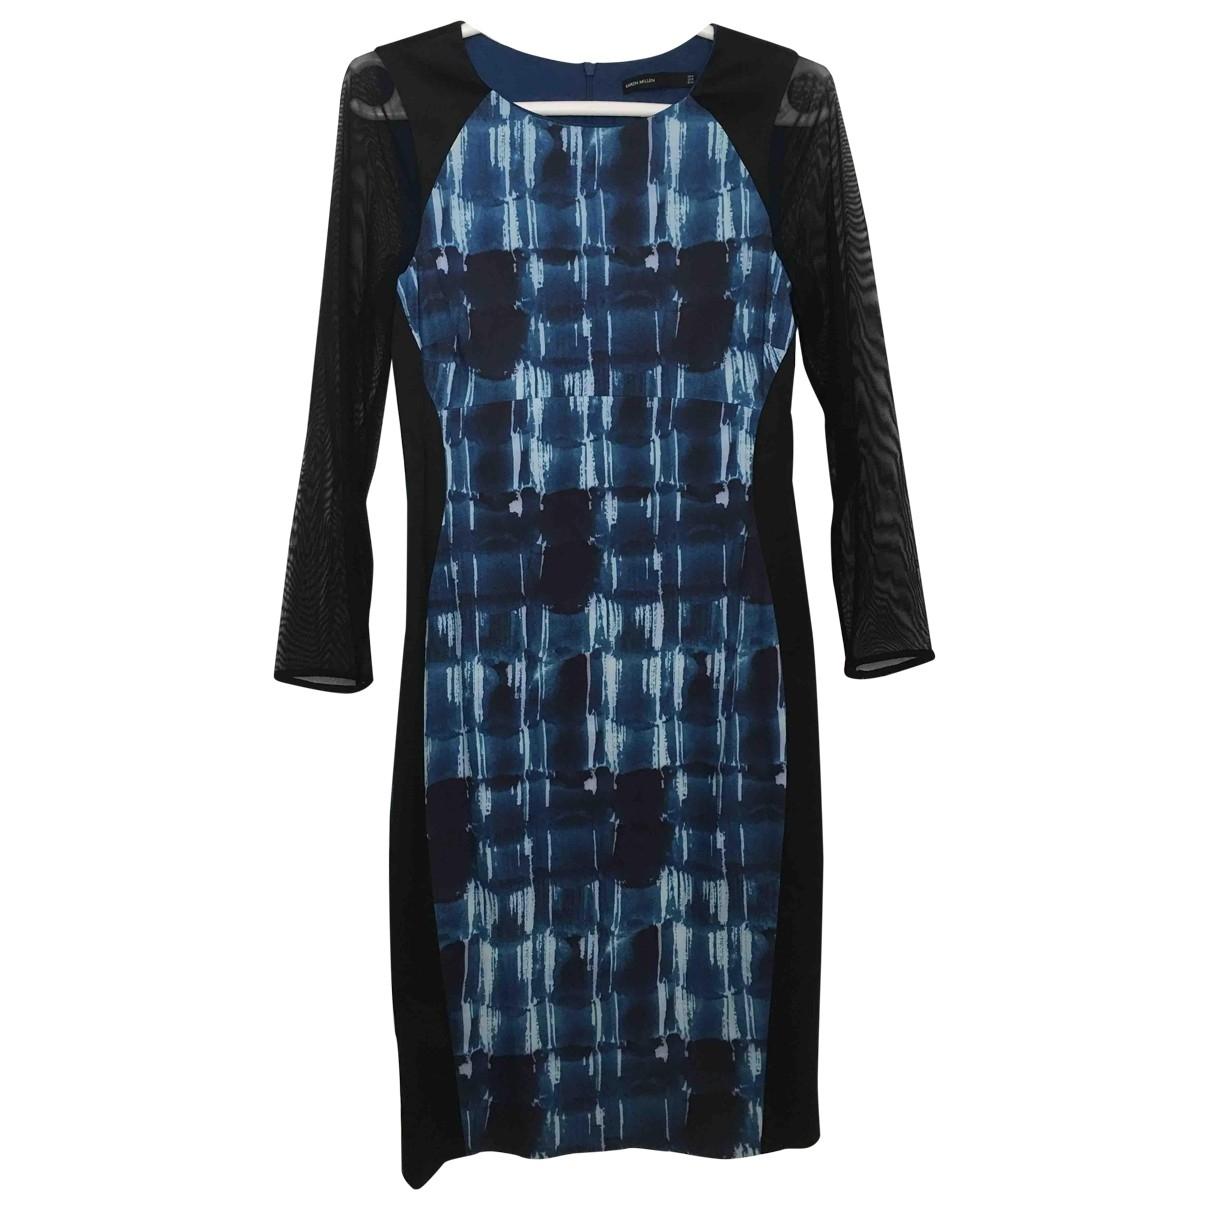 Karen Millen \N Blue dress for Women 14 UK